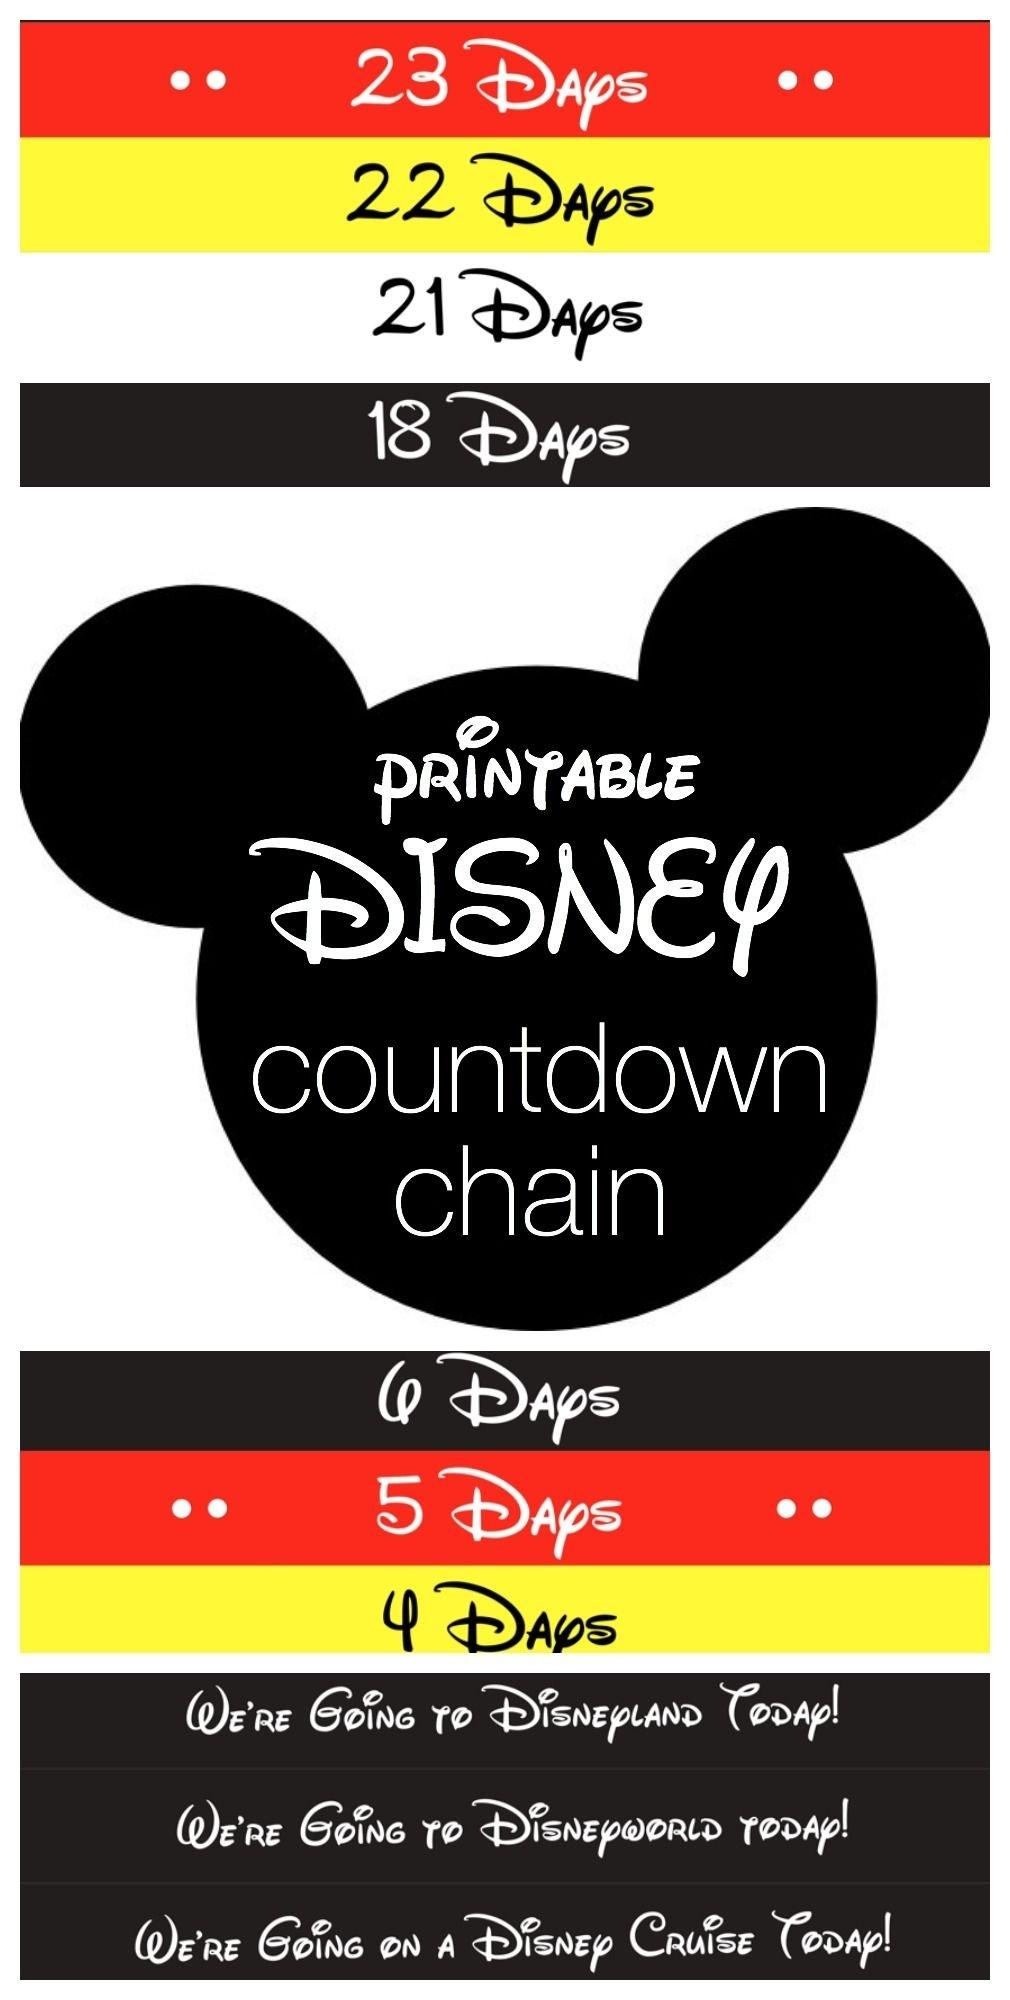 Disney Countdown Chain | Best Of Pinterest | Disney Countdown Disney Countdown Calendar App